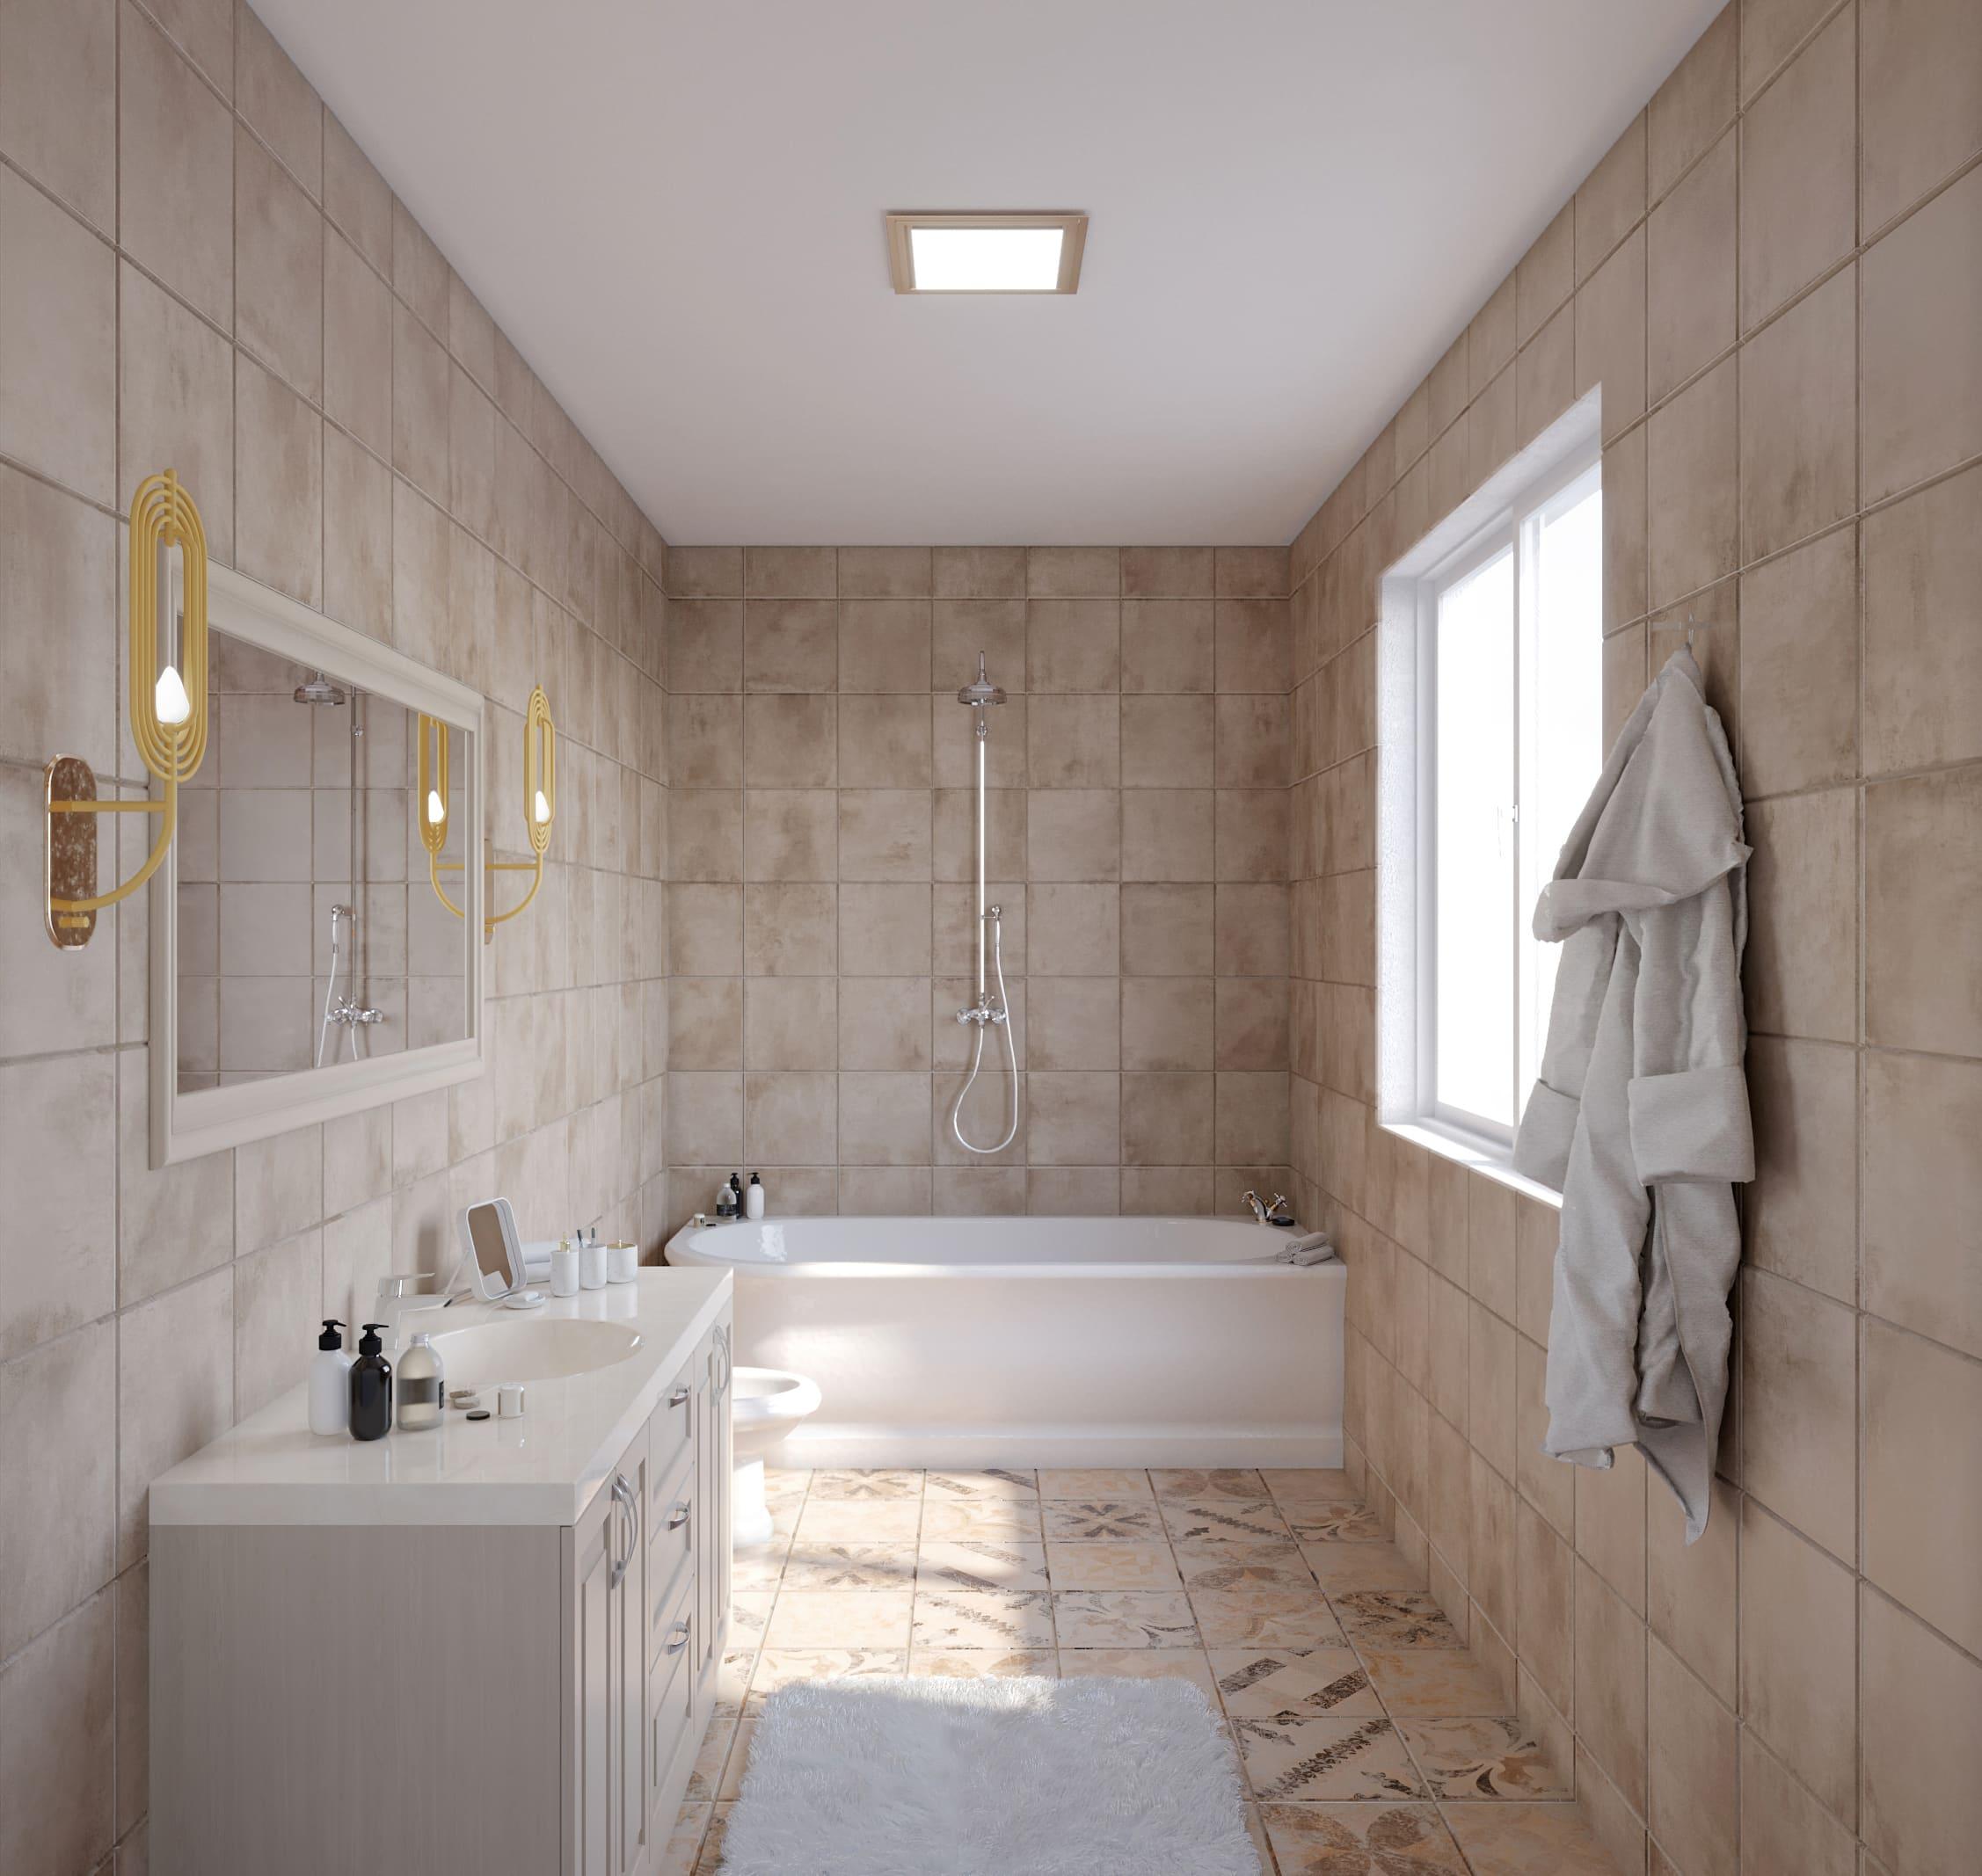 Salle de bain Avant ecoshower_douche senior